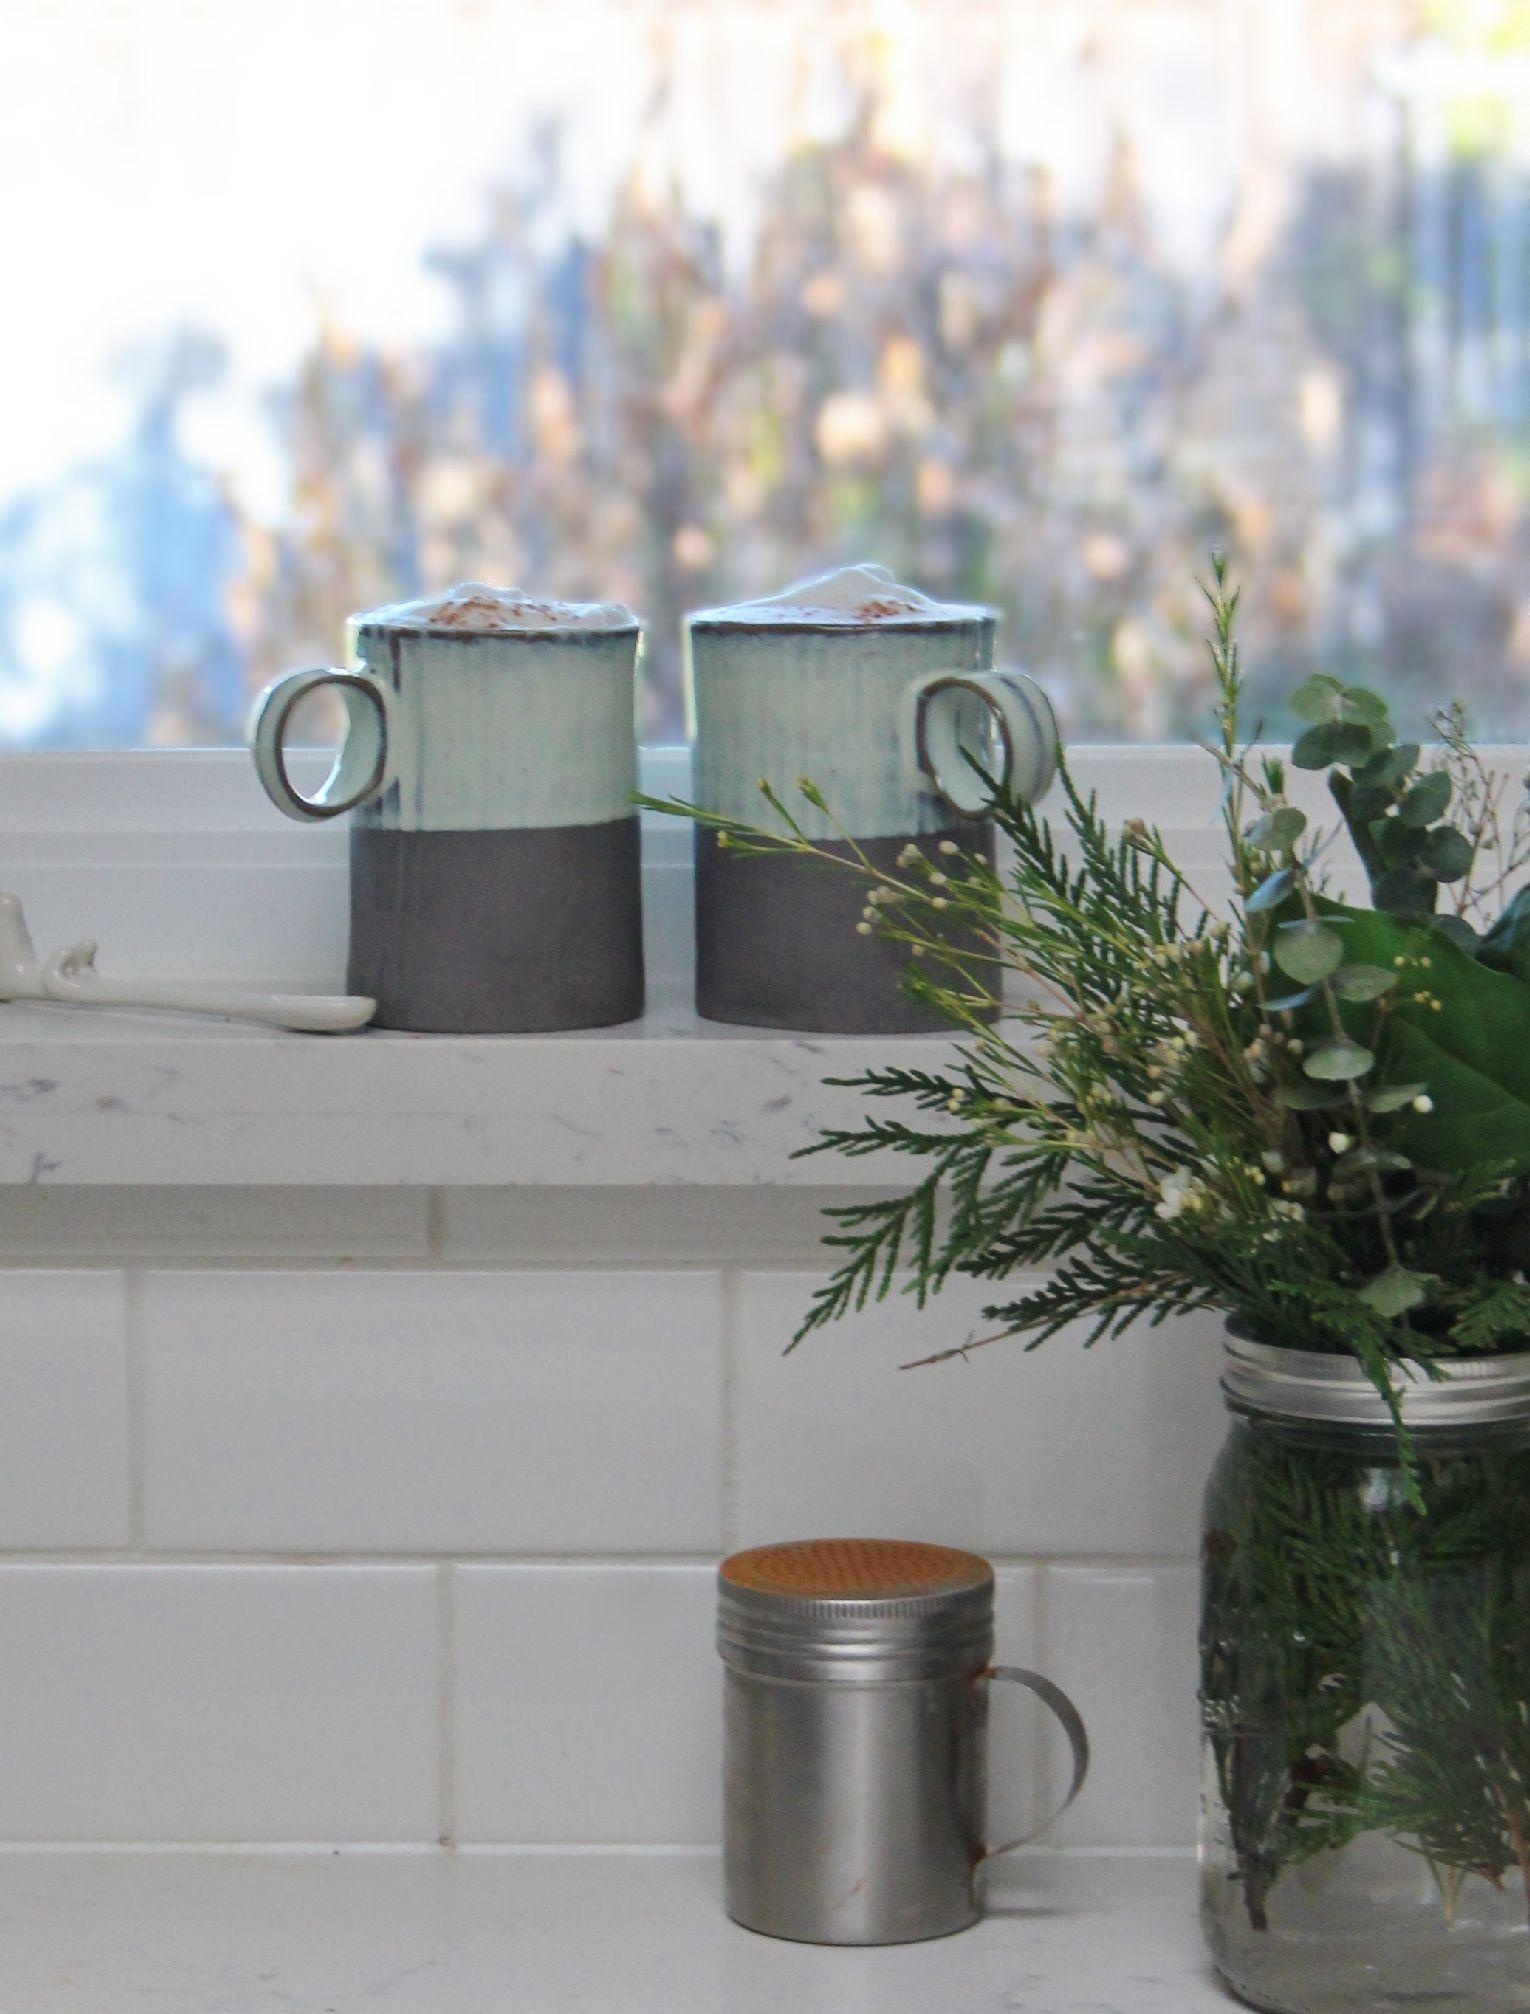 London fog earl grey latte the secret to frothing milk a spot of winter bliss solutioingenieria Images